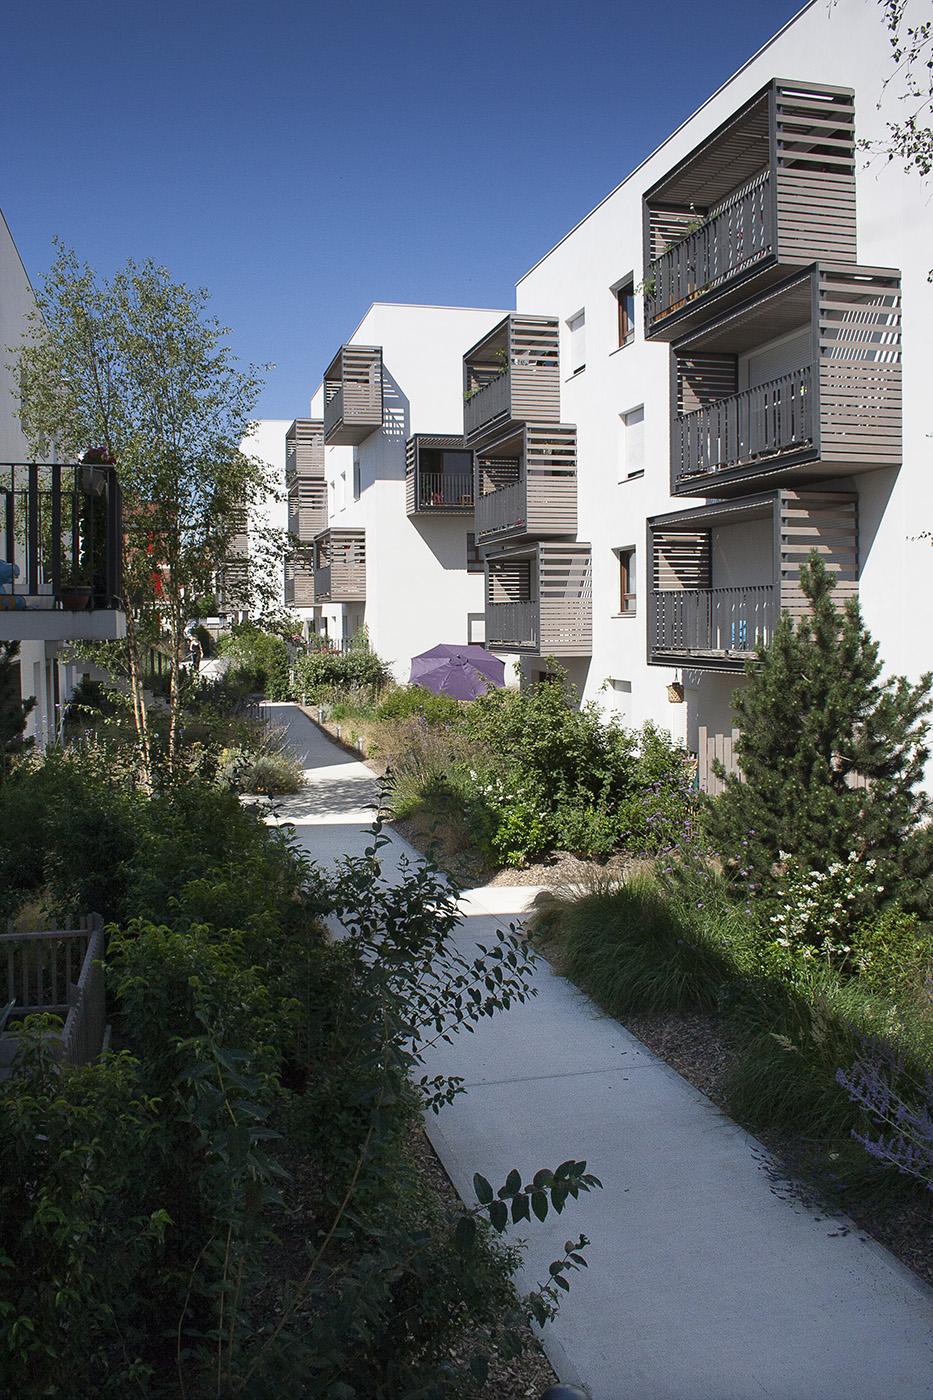 Les jardins inattendus la compagnie du paysage for Central jardin rixensart